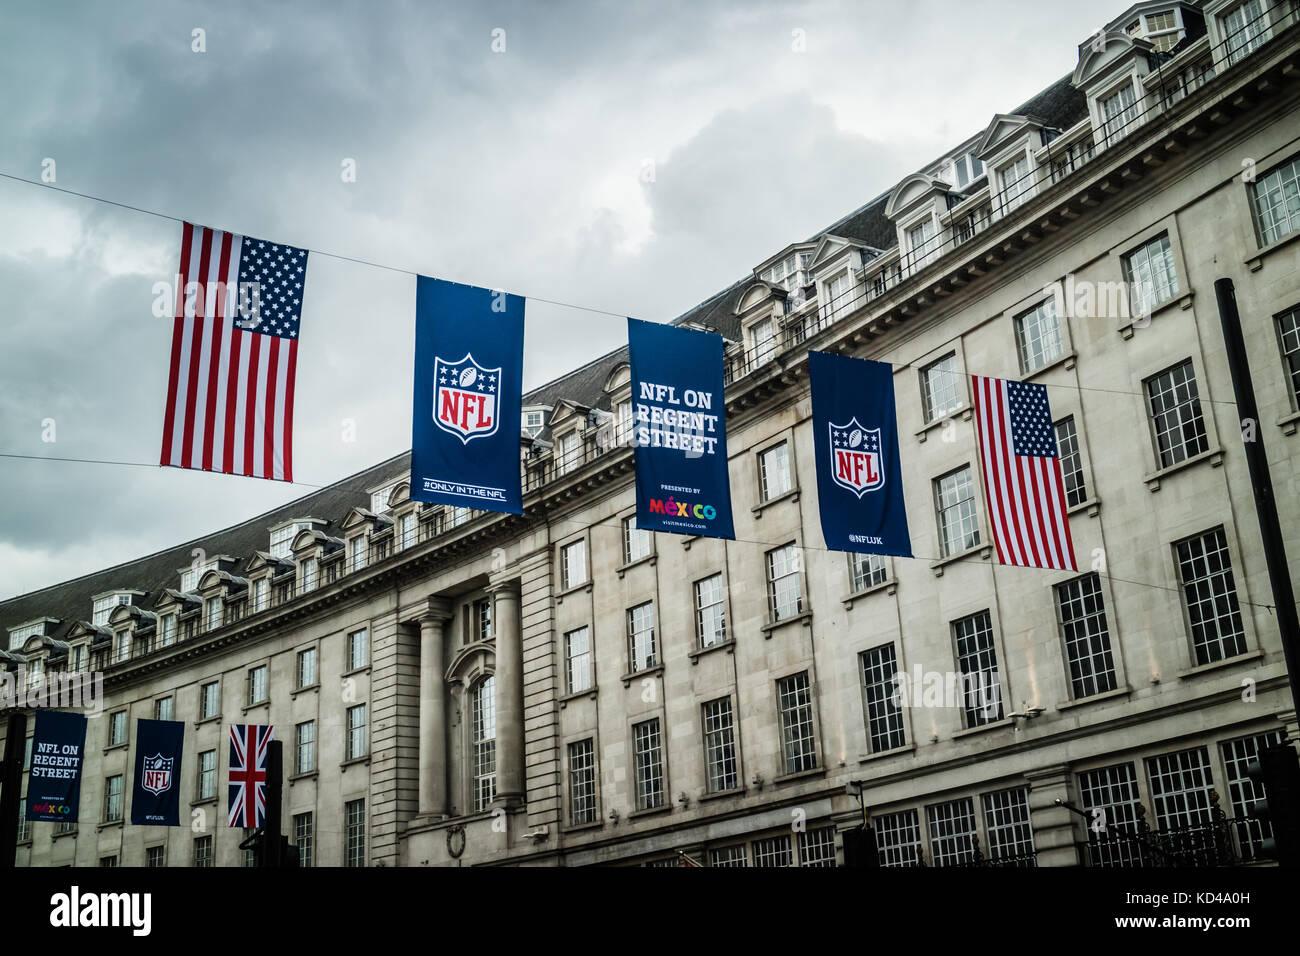 NFL UK event banners and US Flag hanging on Regents Street, London, England, UK - Stock Image